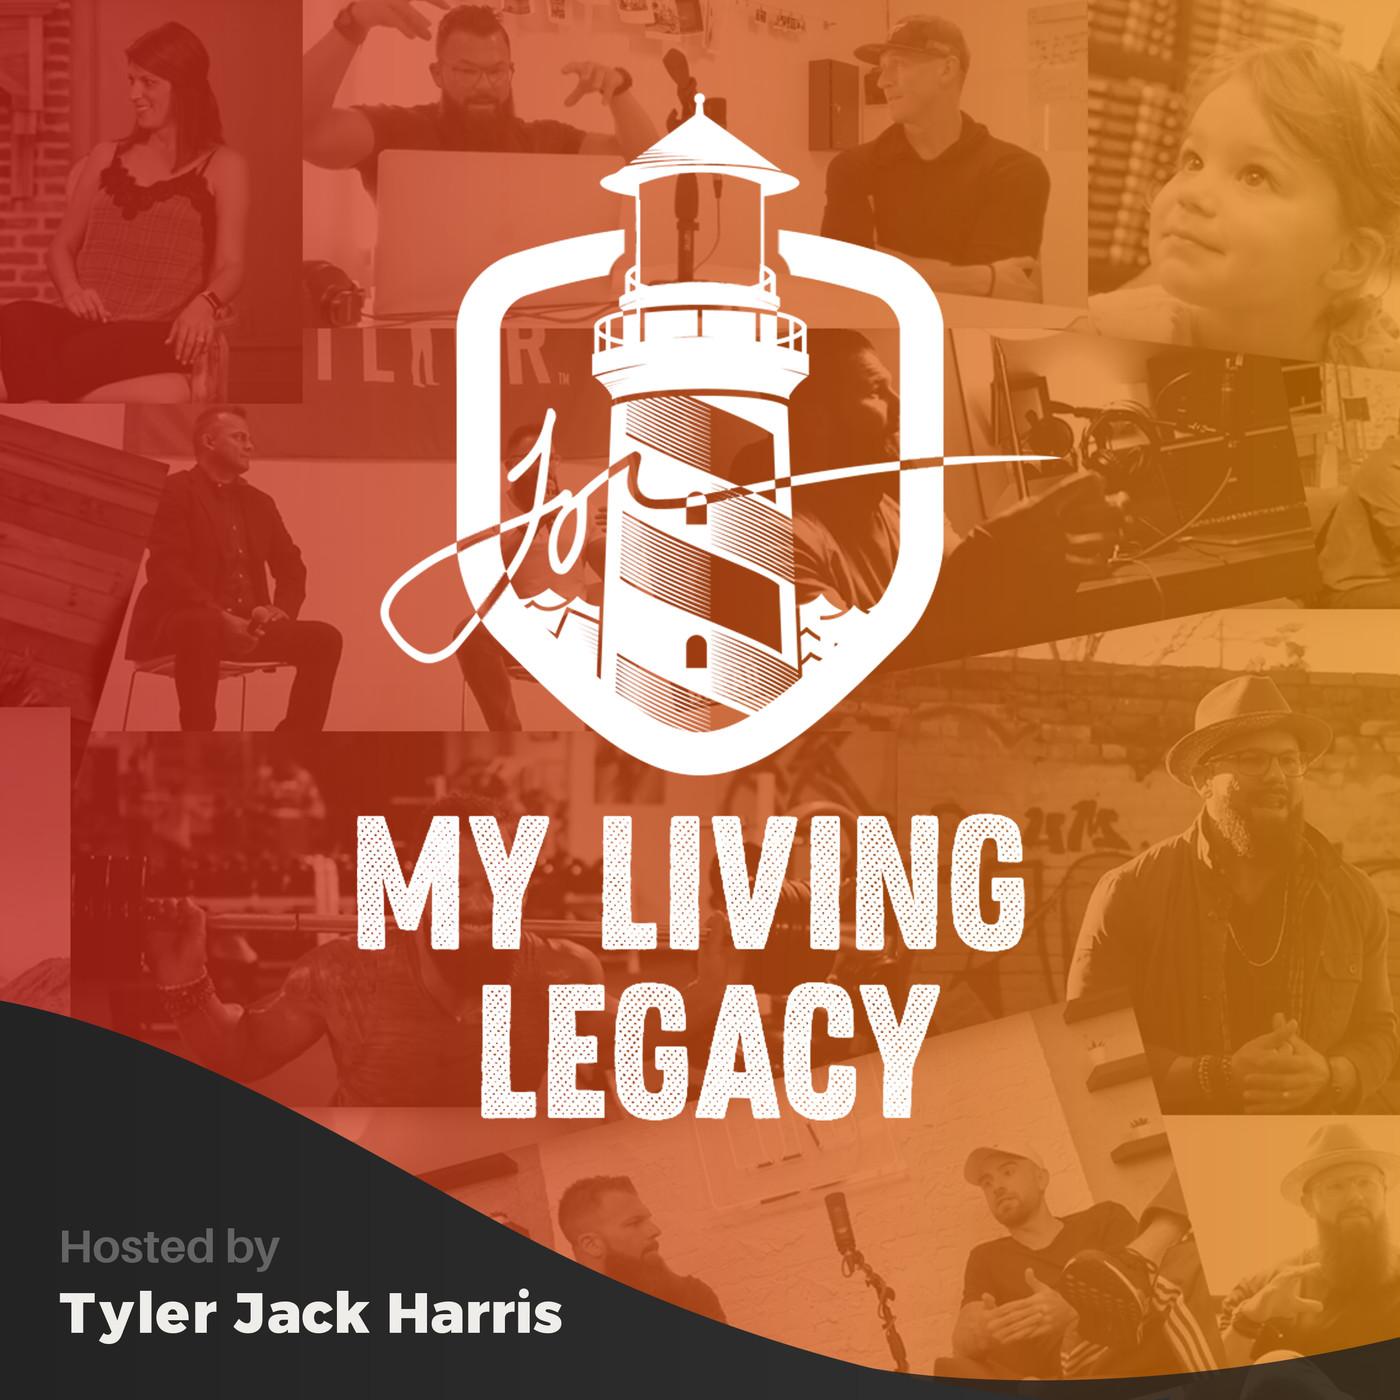 The Tyler Jack Harris Collecti